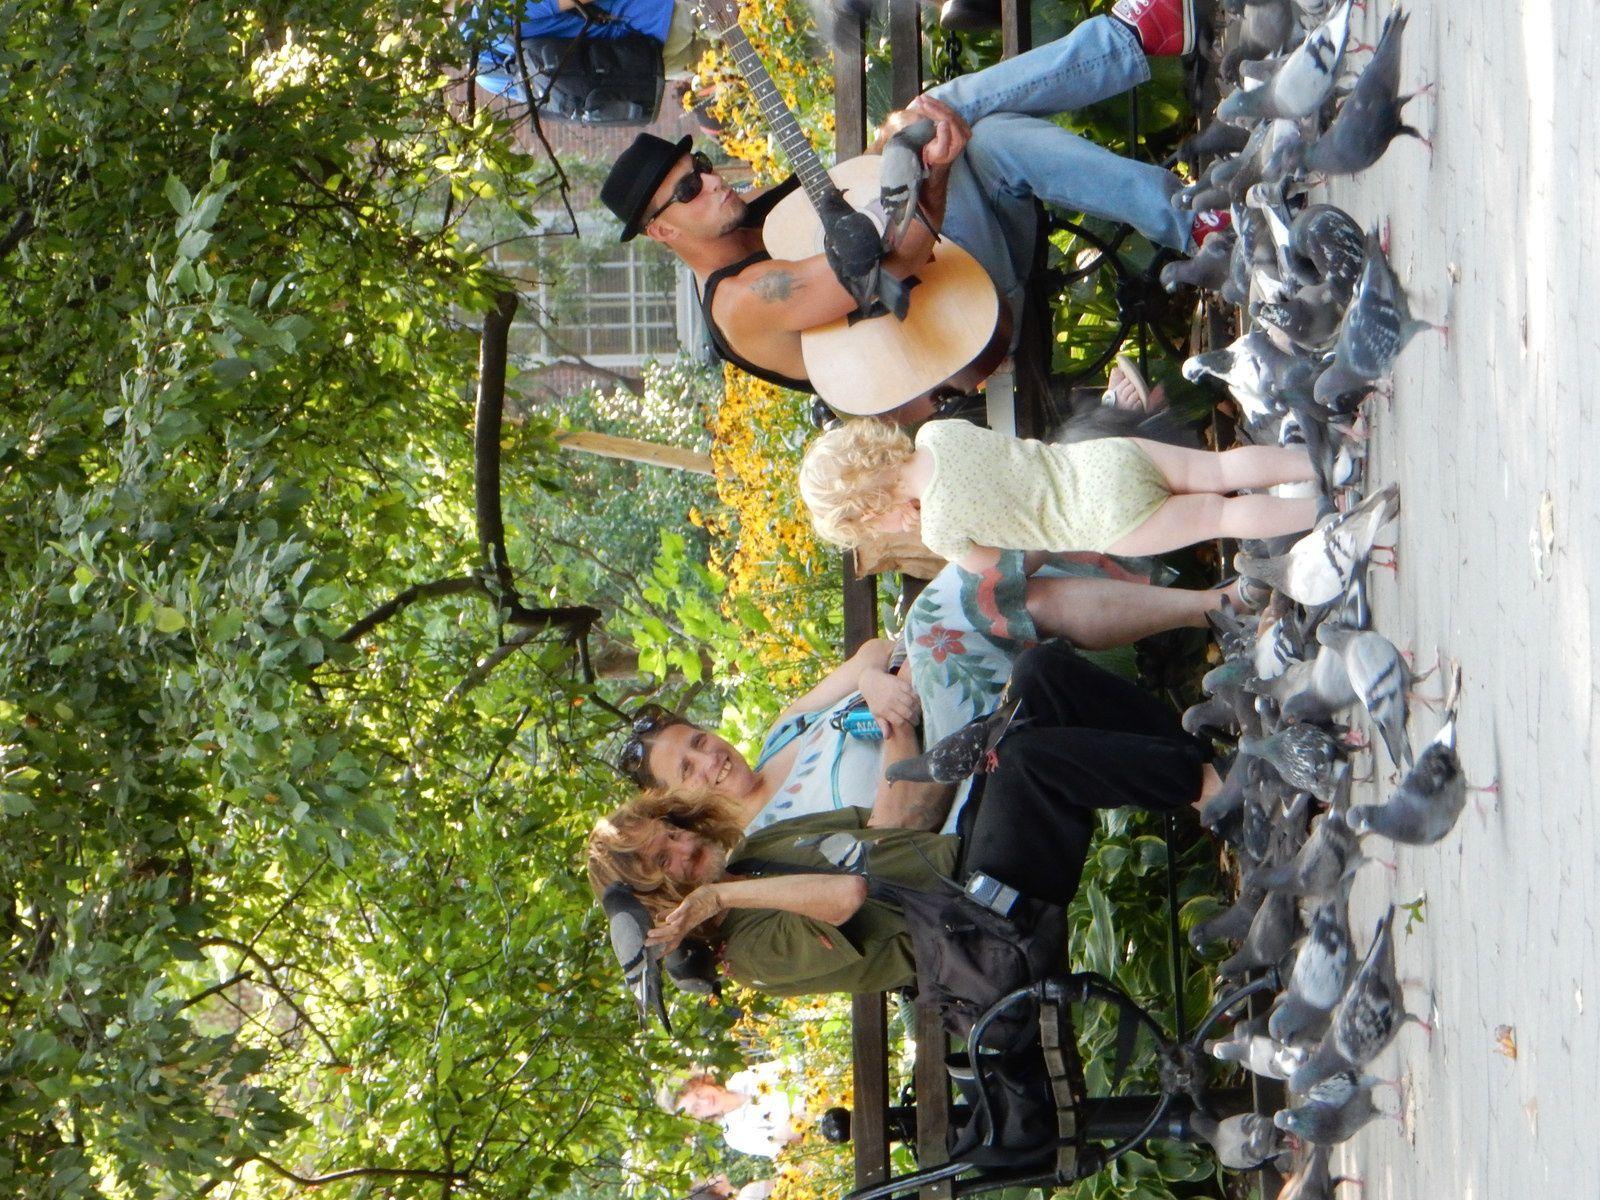 Washington Park, NYC - Août 2014